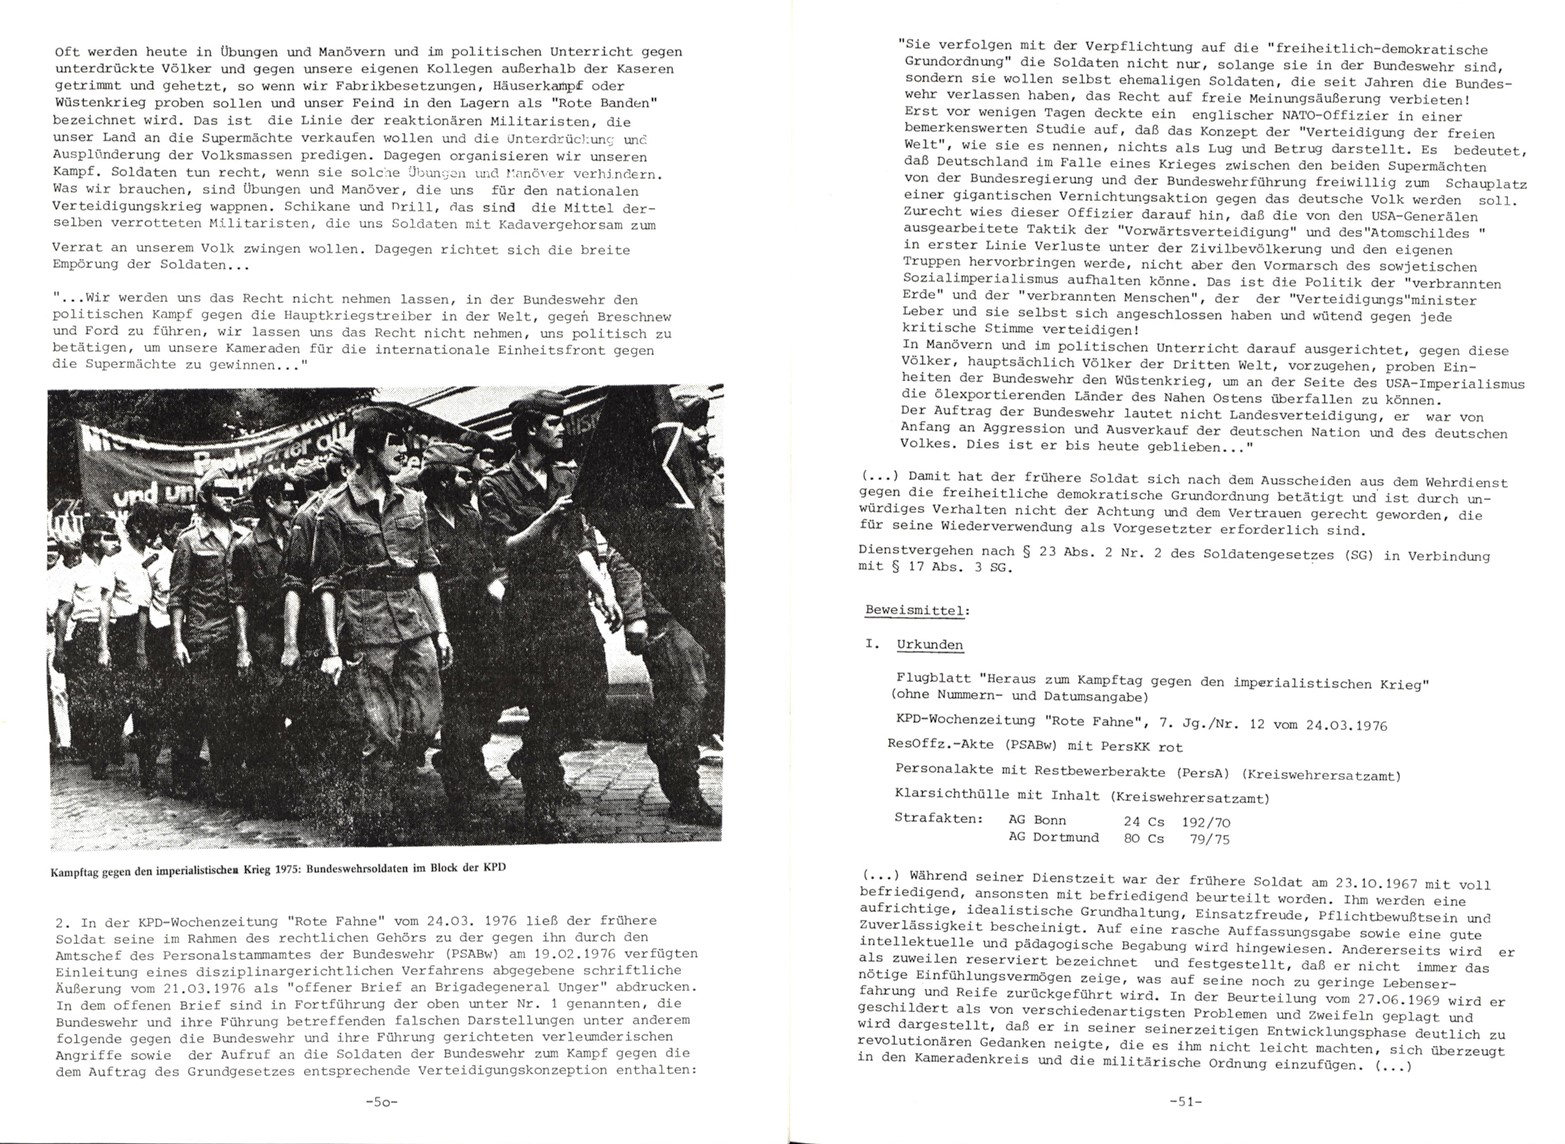 KPDAO_1976_Staatsschutzparagrafen_26